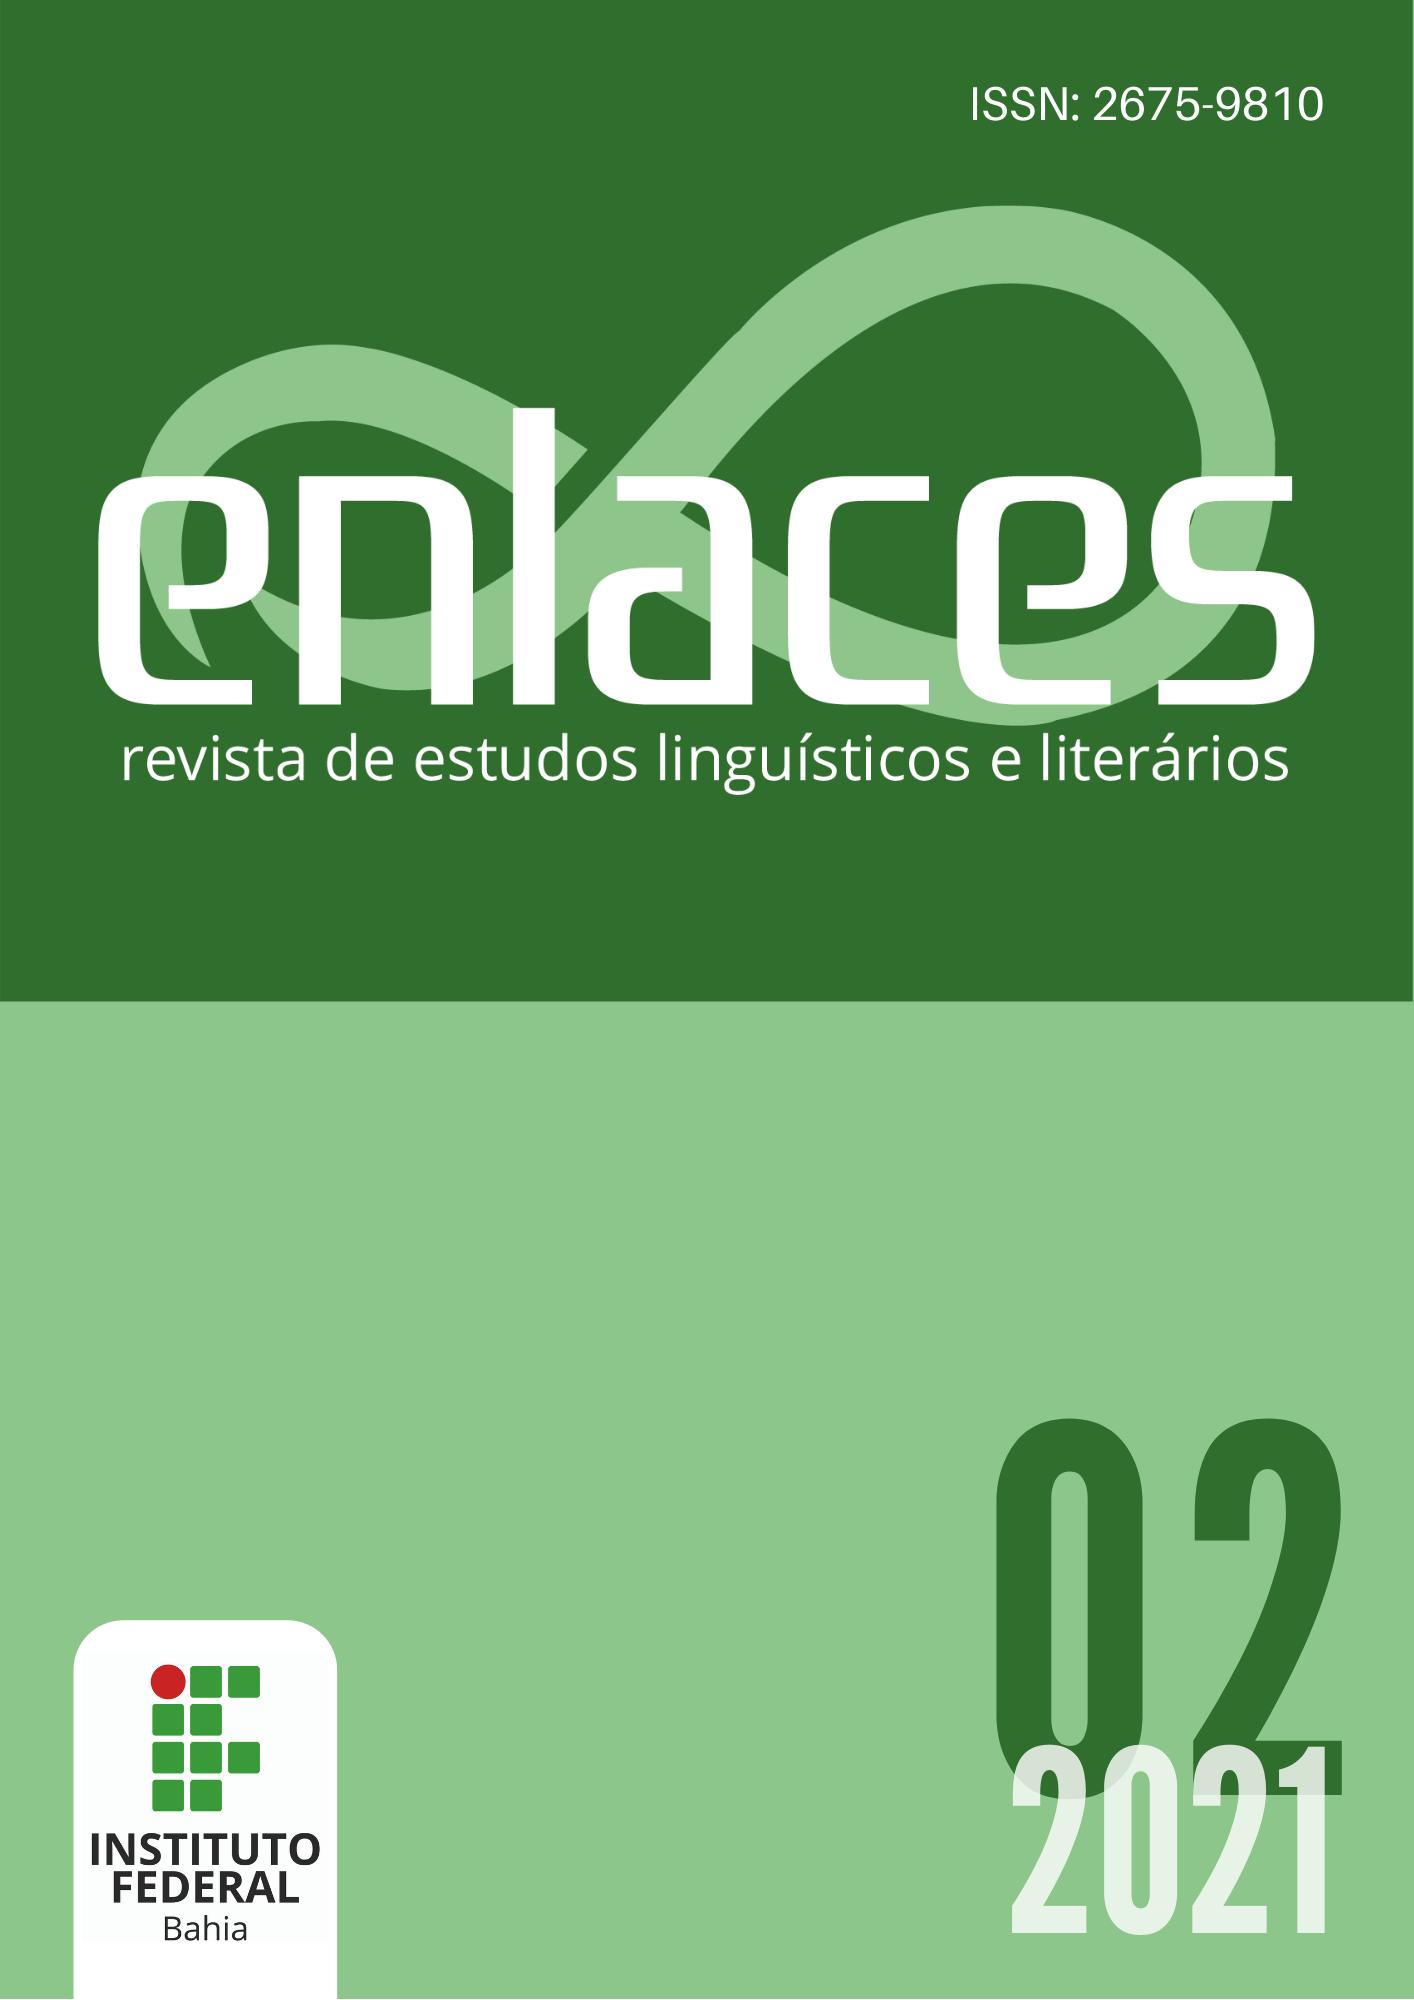 Capa do volume 2, ano 2021